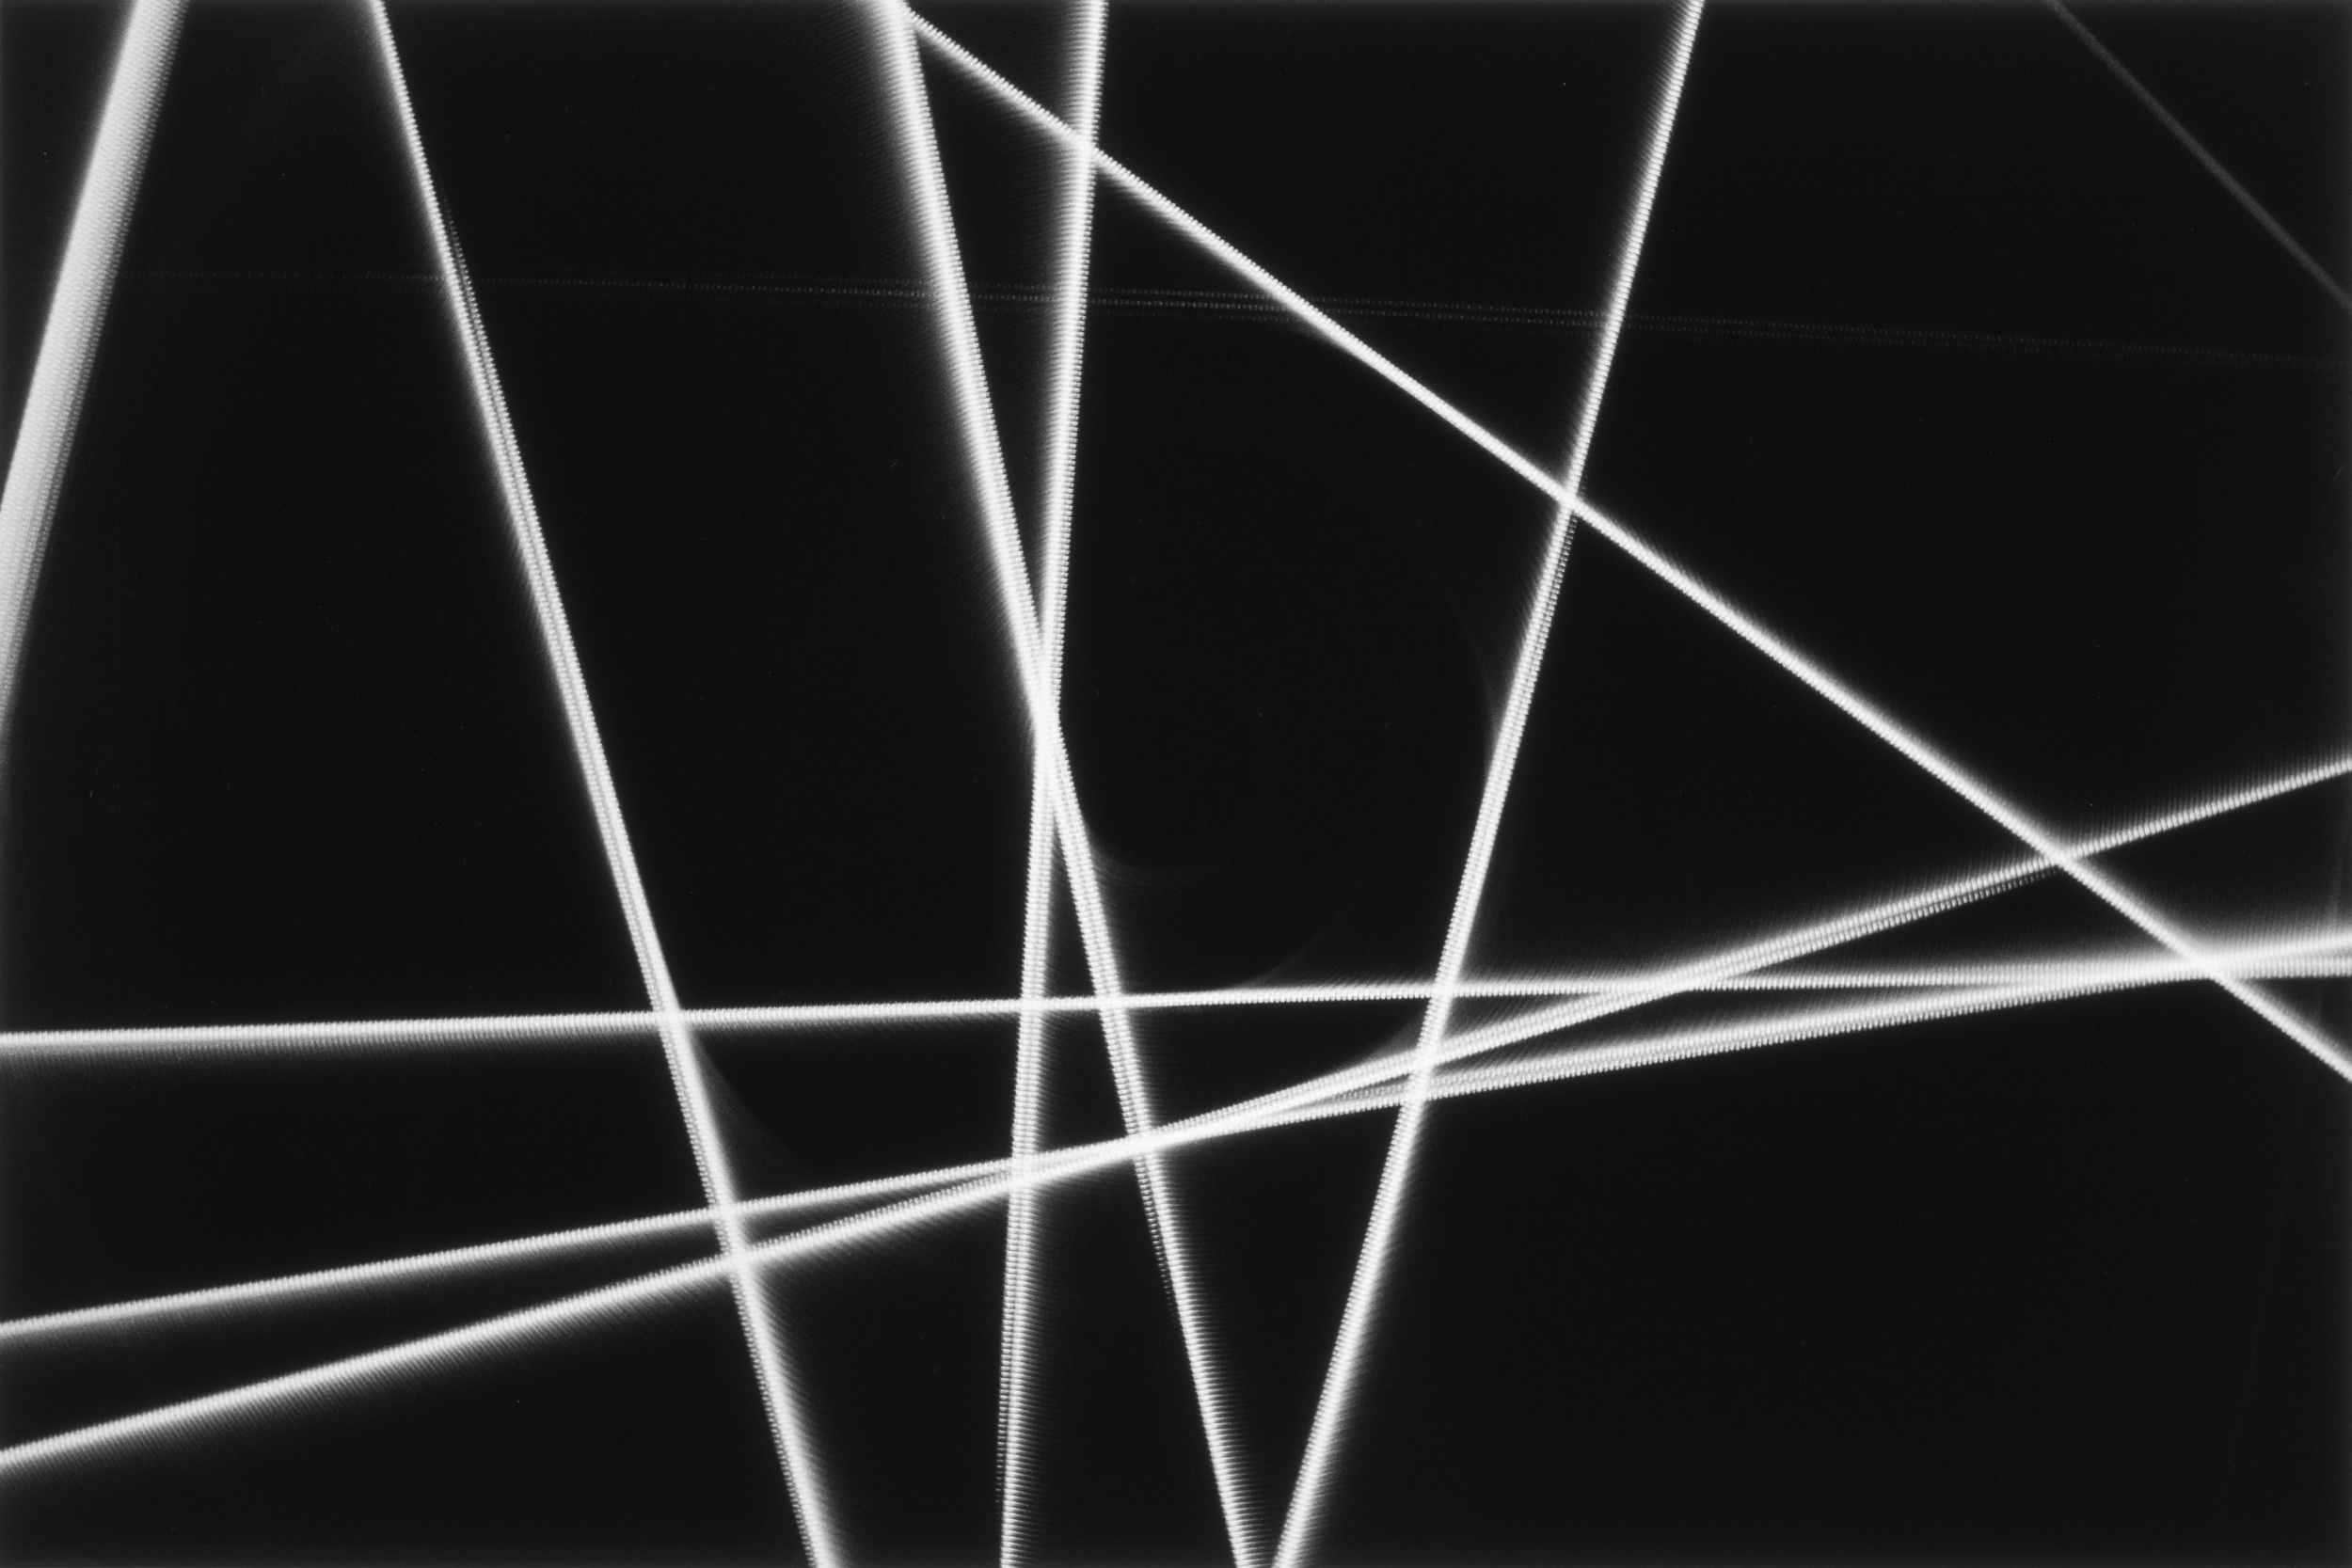 Television Noise 12, 2006